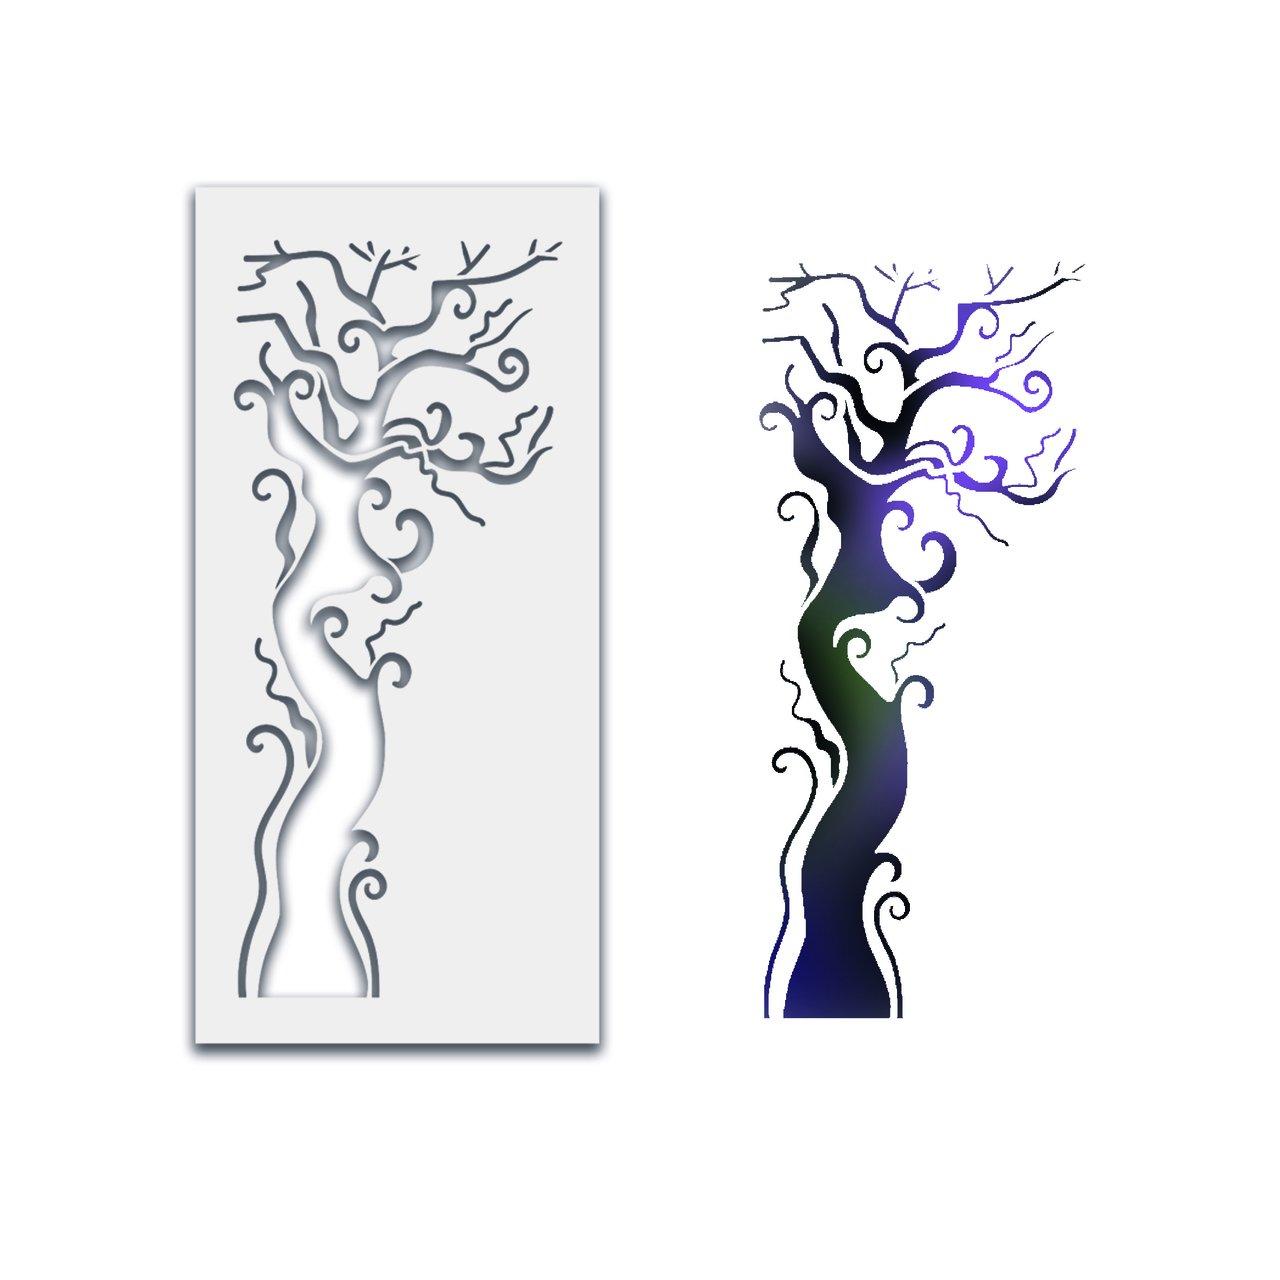 Polkadoodles Stencil - Creepy Tree